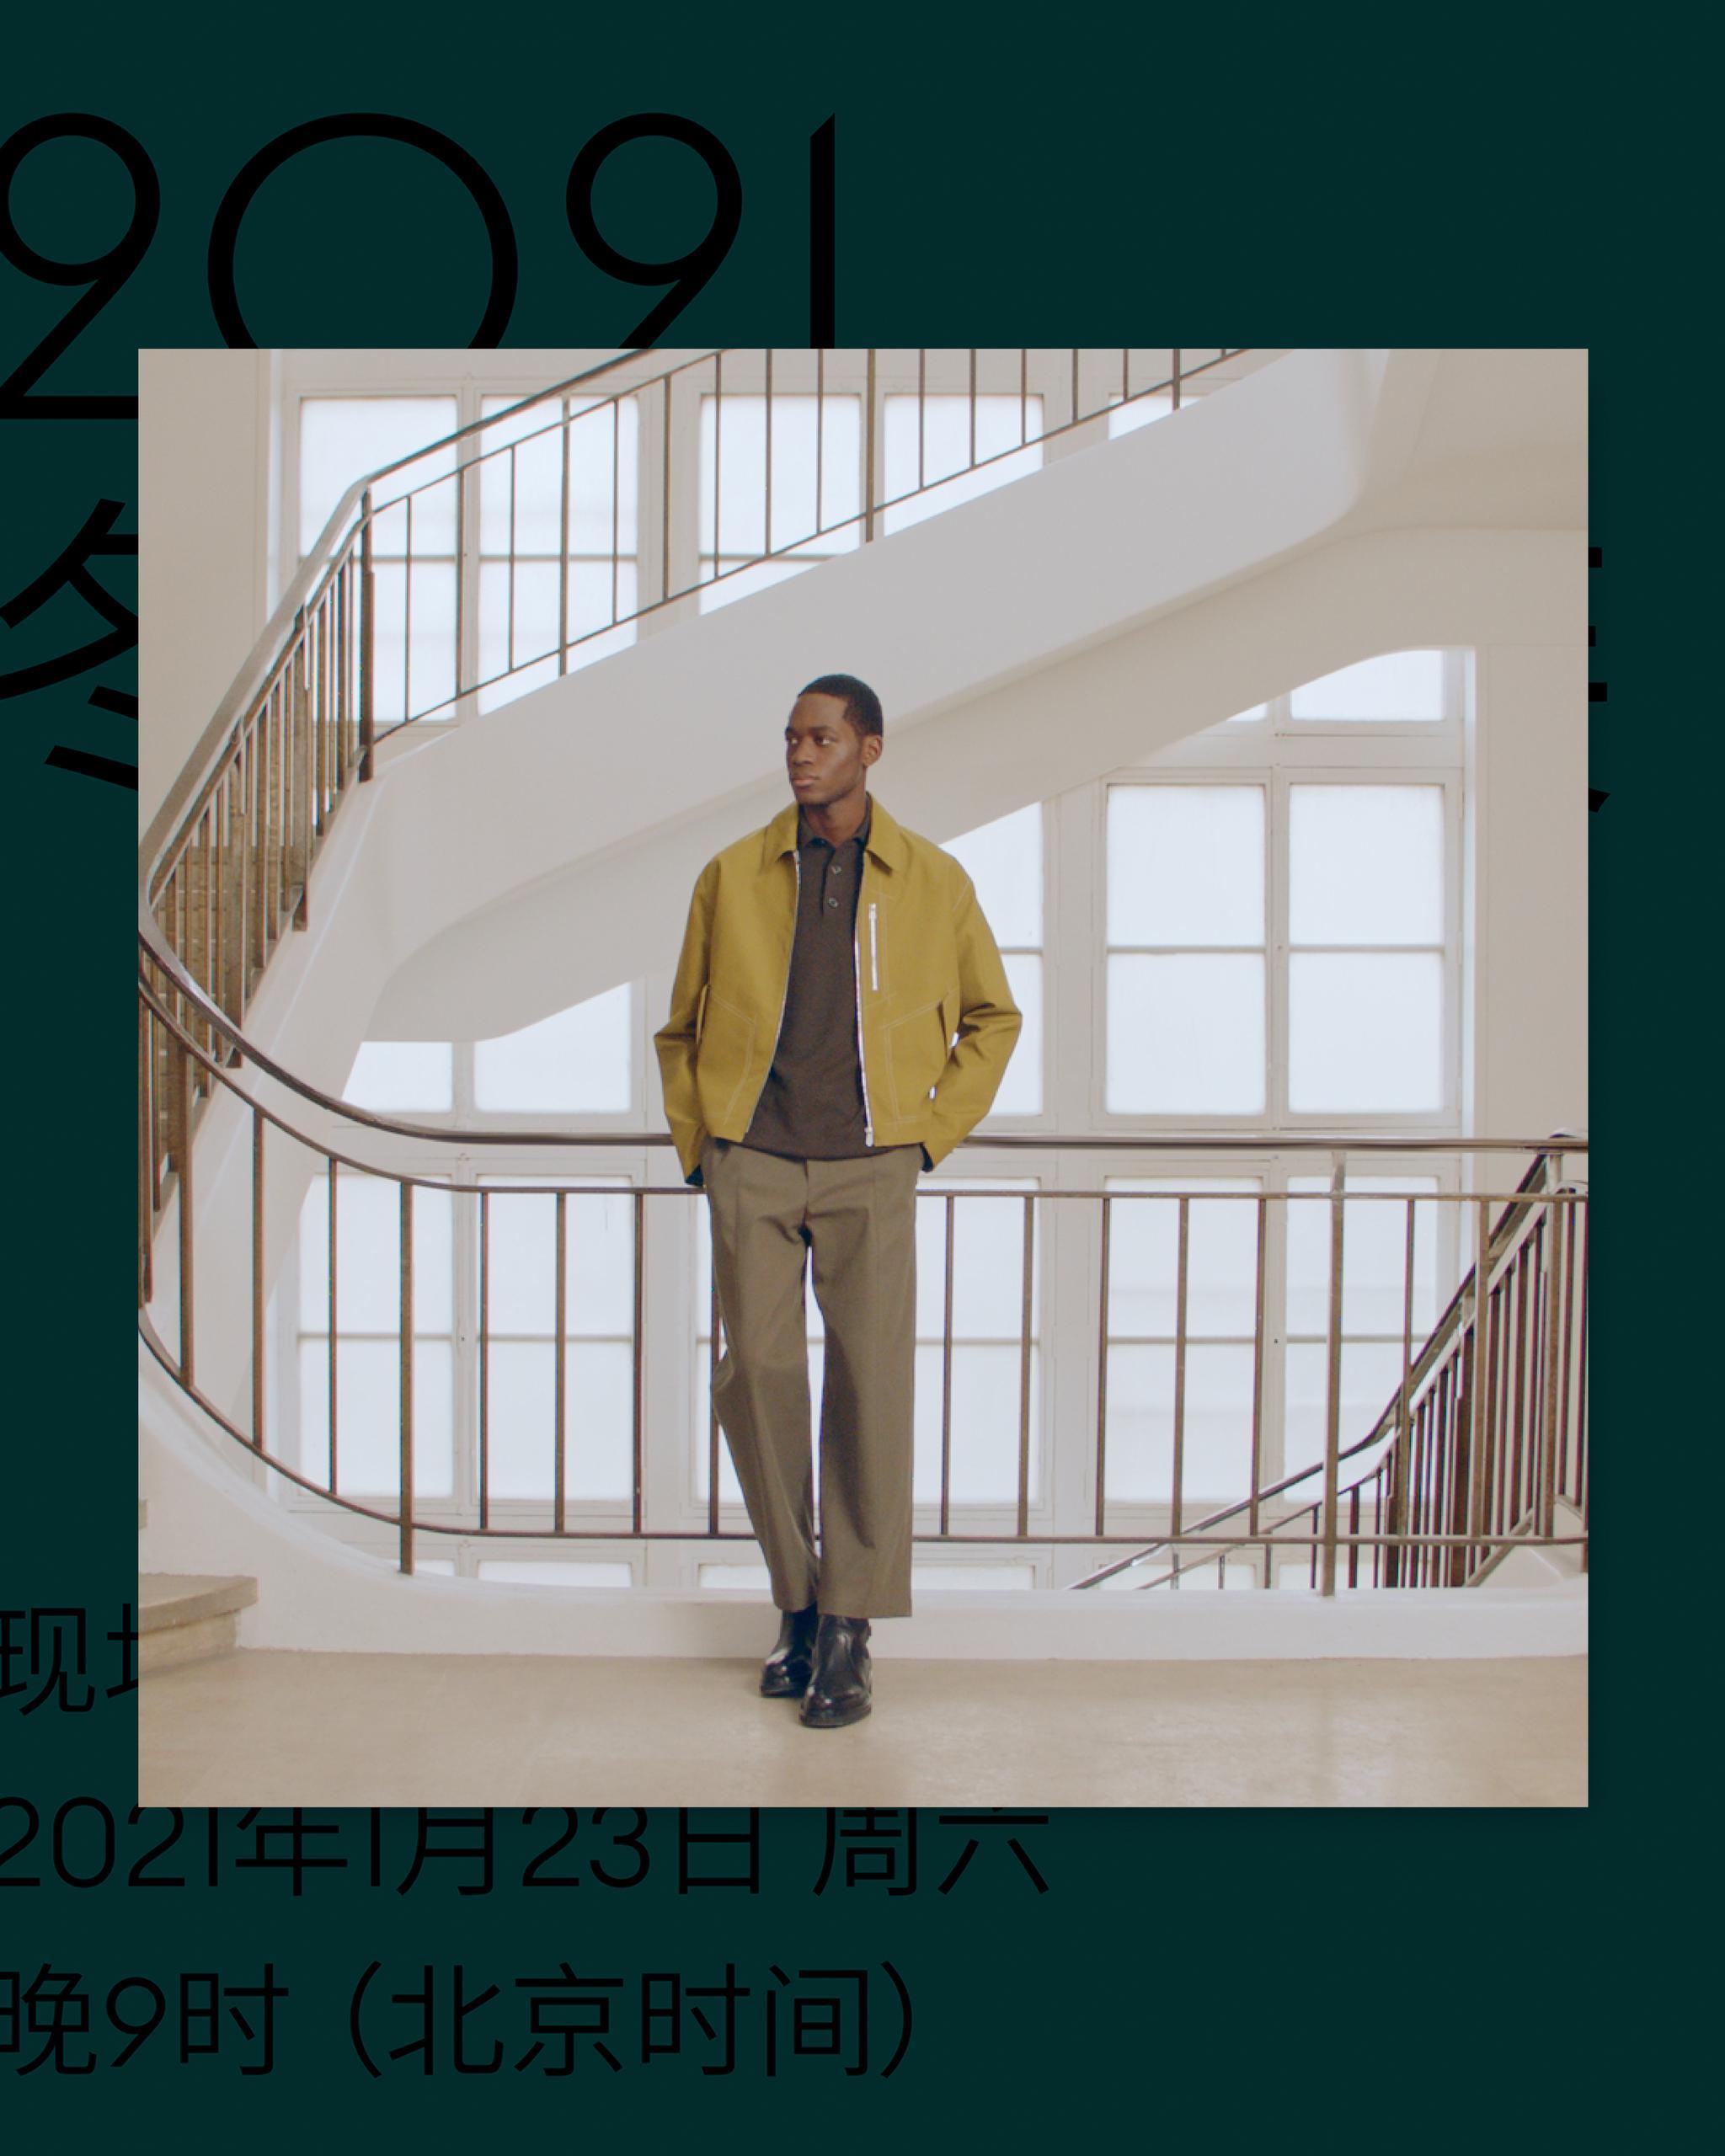 Hermès 2021秋冬男装系列:像一位与崩溃和解的成年人